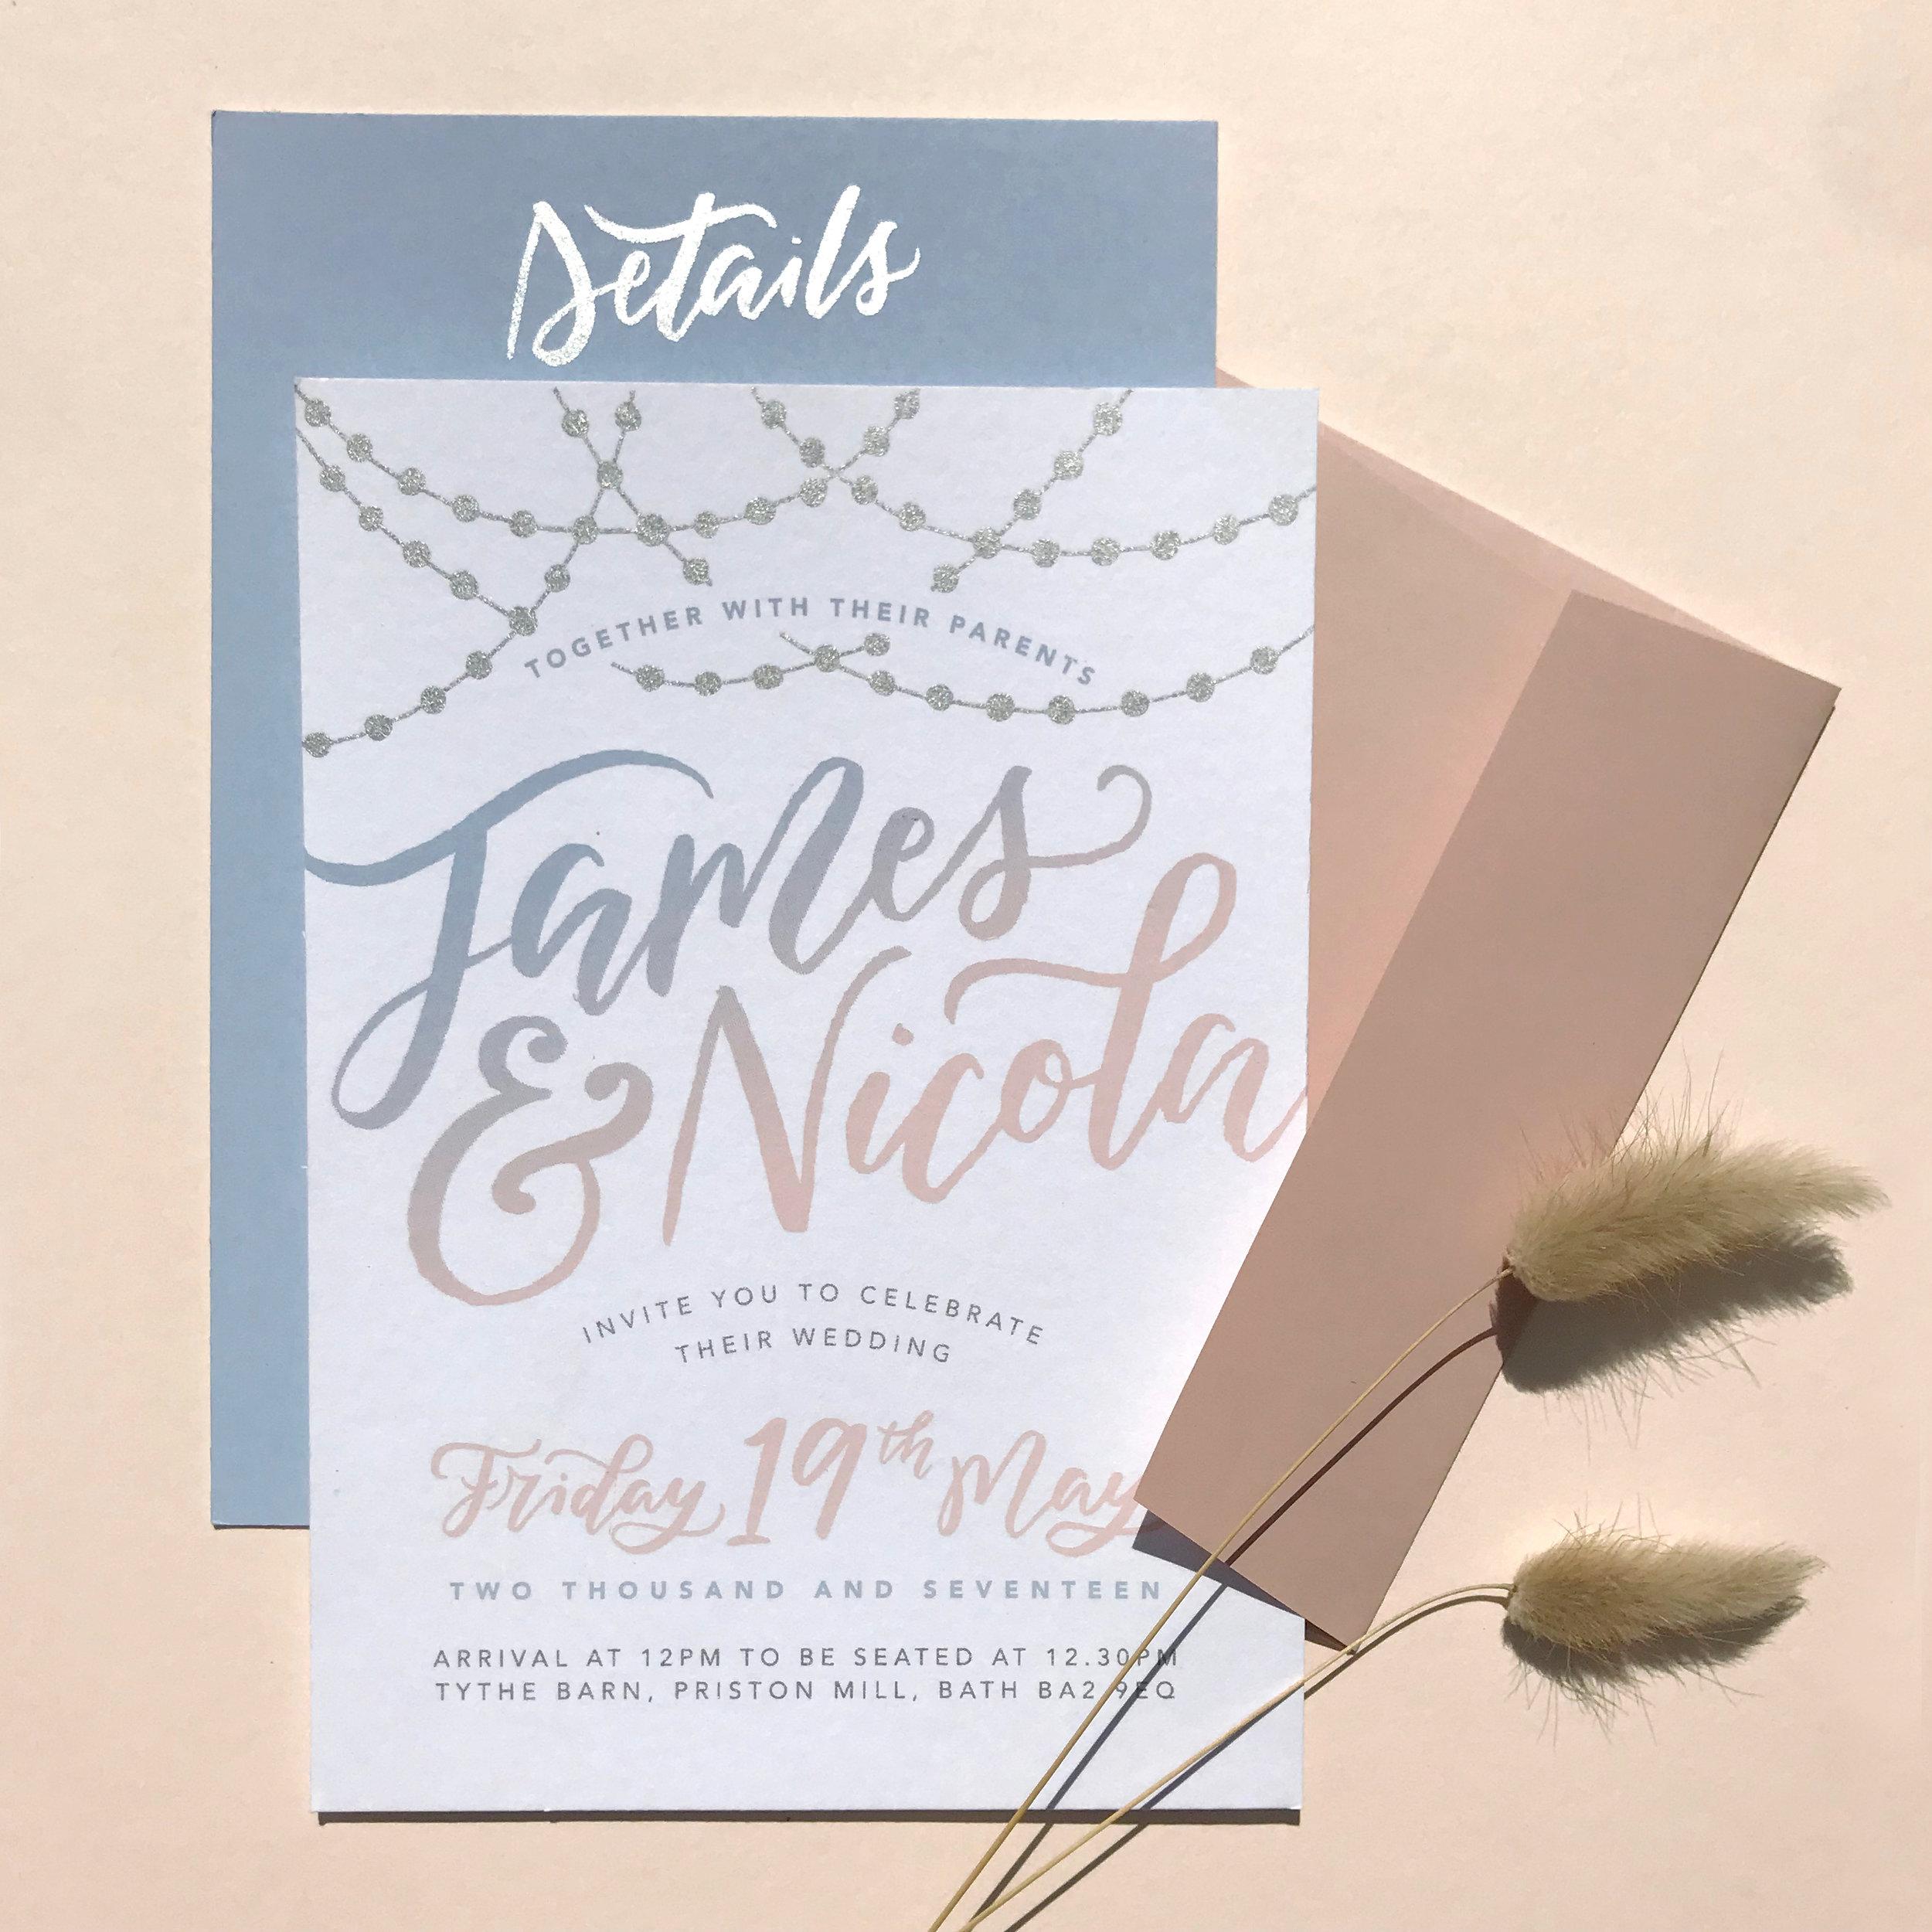 silver_and_blush_wedding_invite.jpg